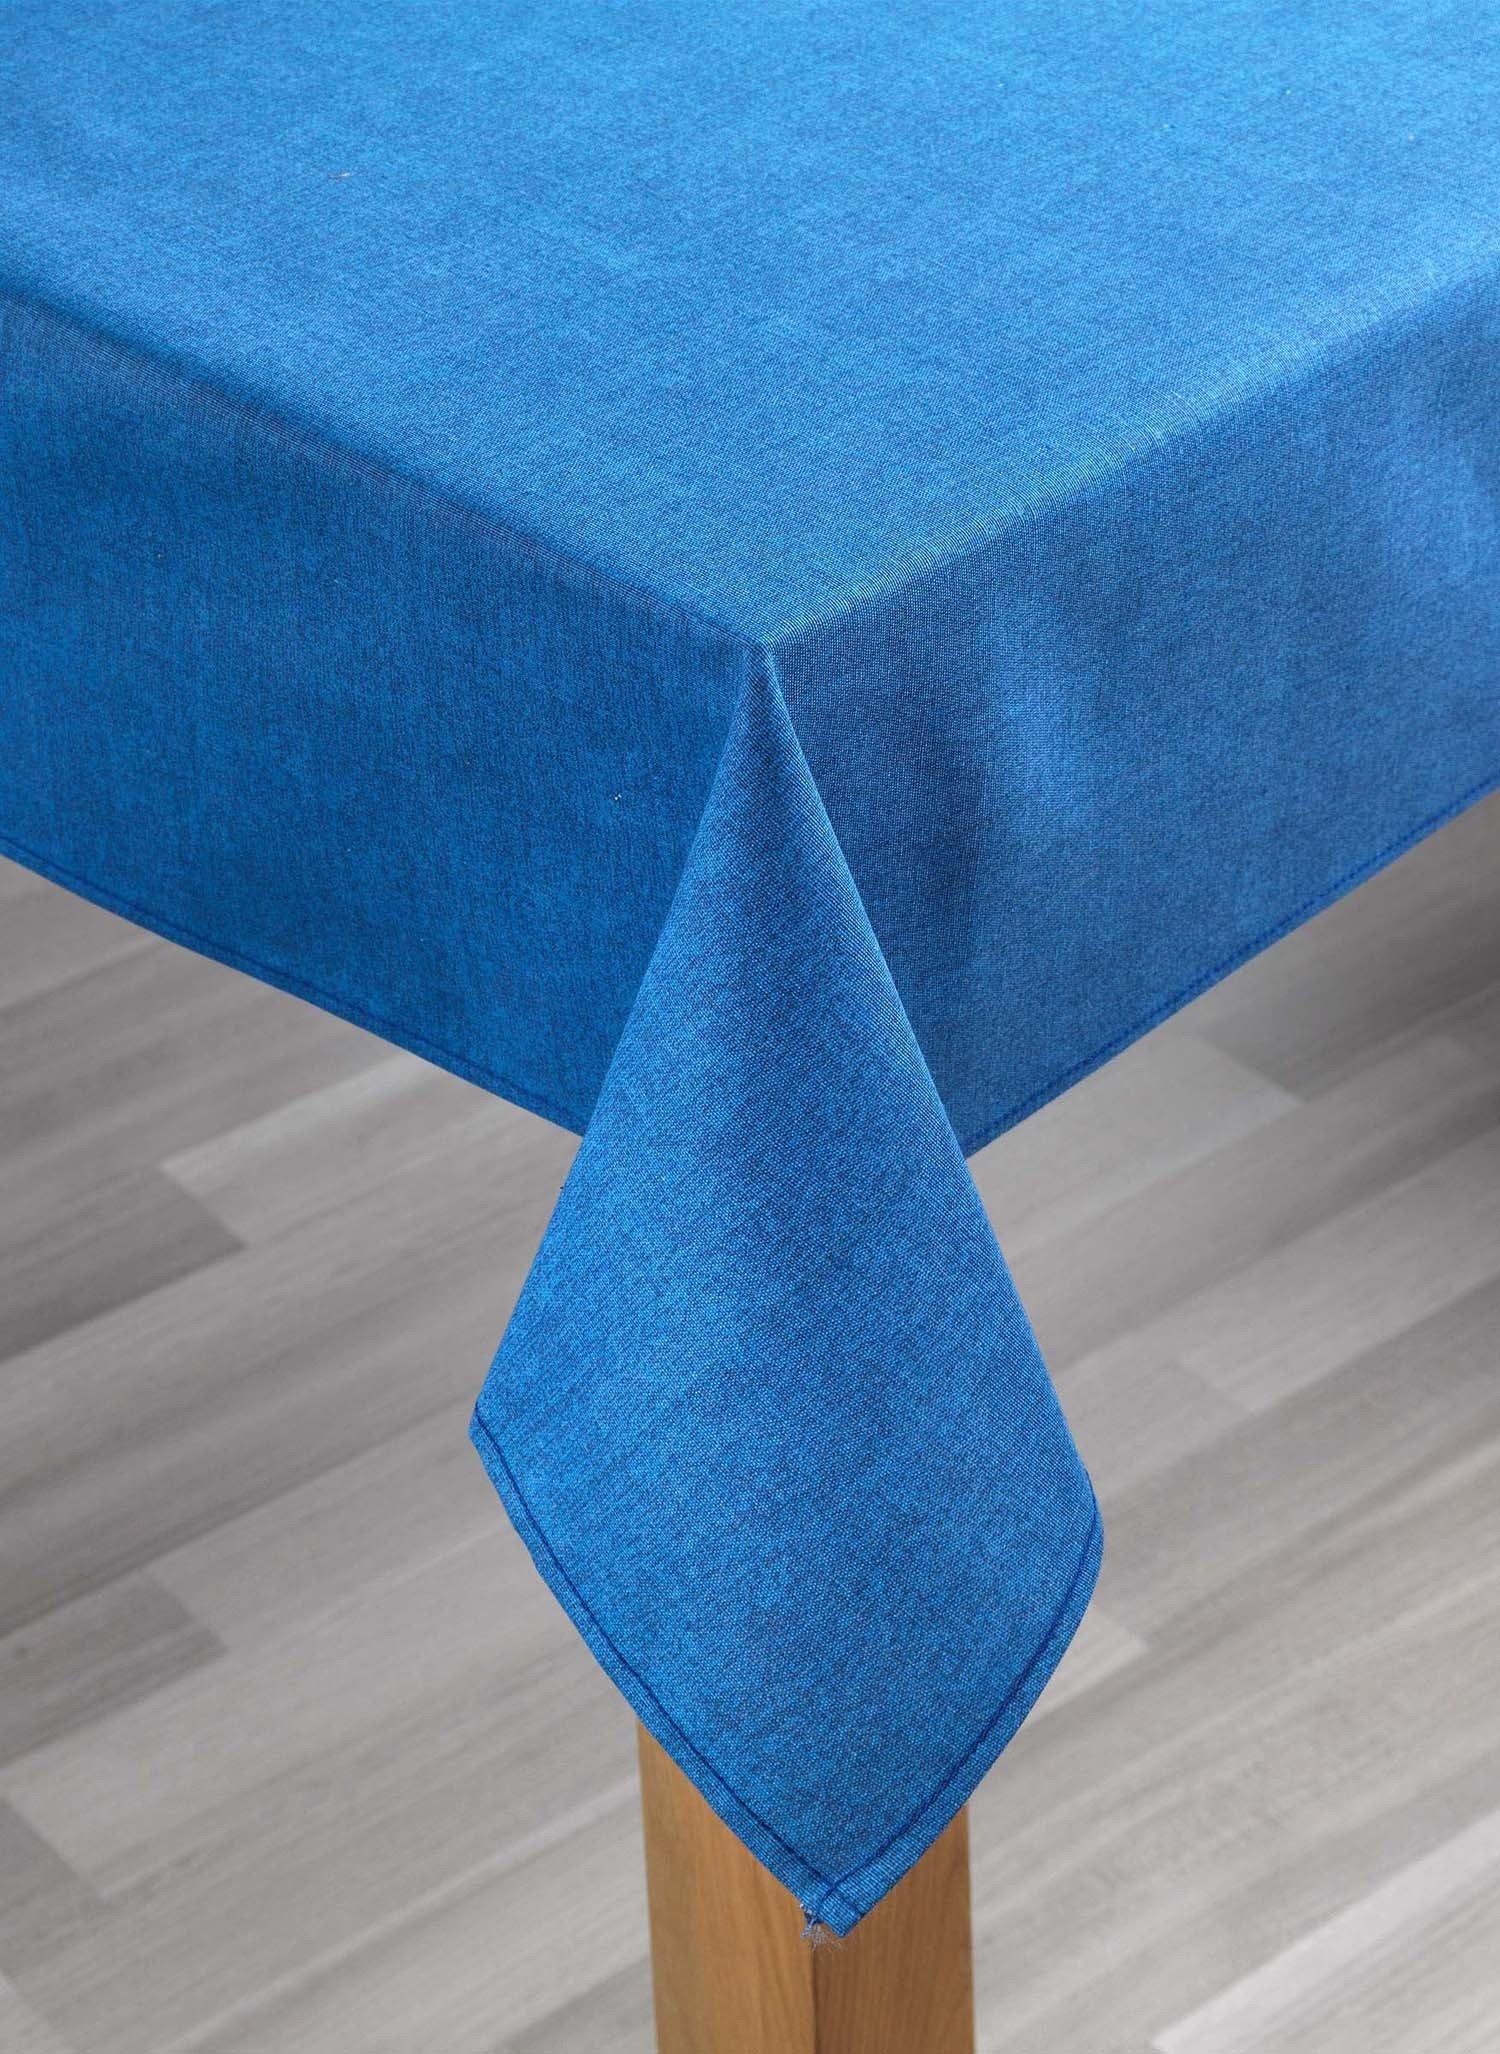 Tischdecke uni blau 140x180cm - 2 - Ronja.ch